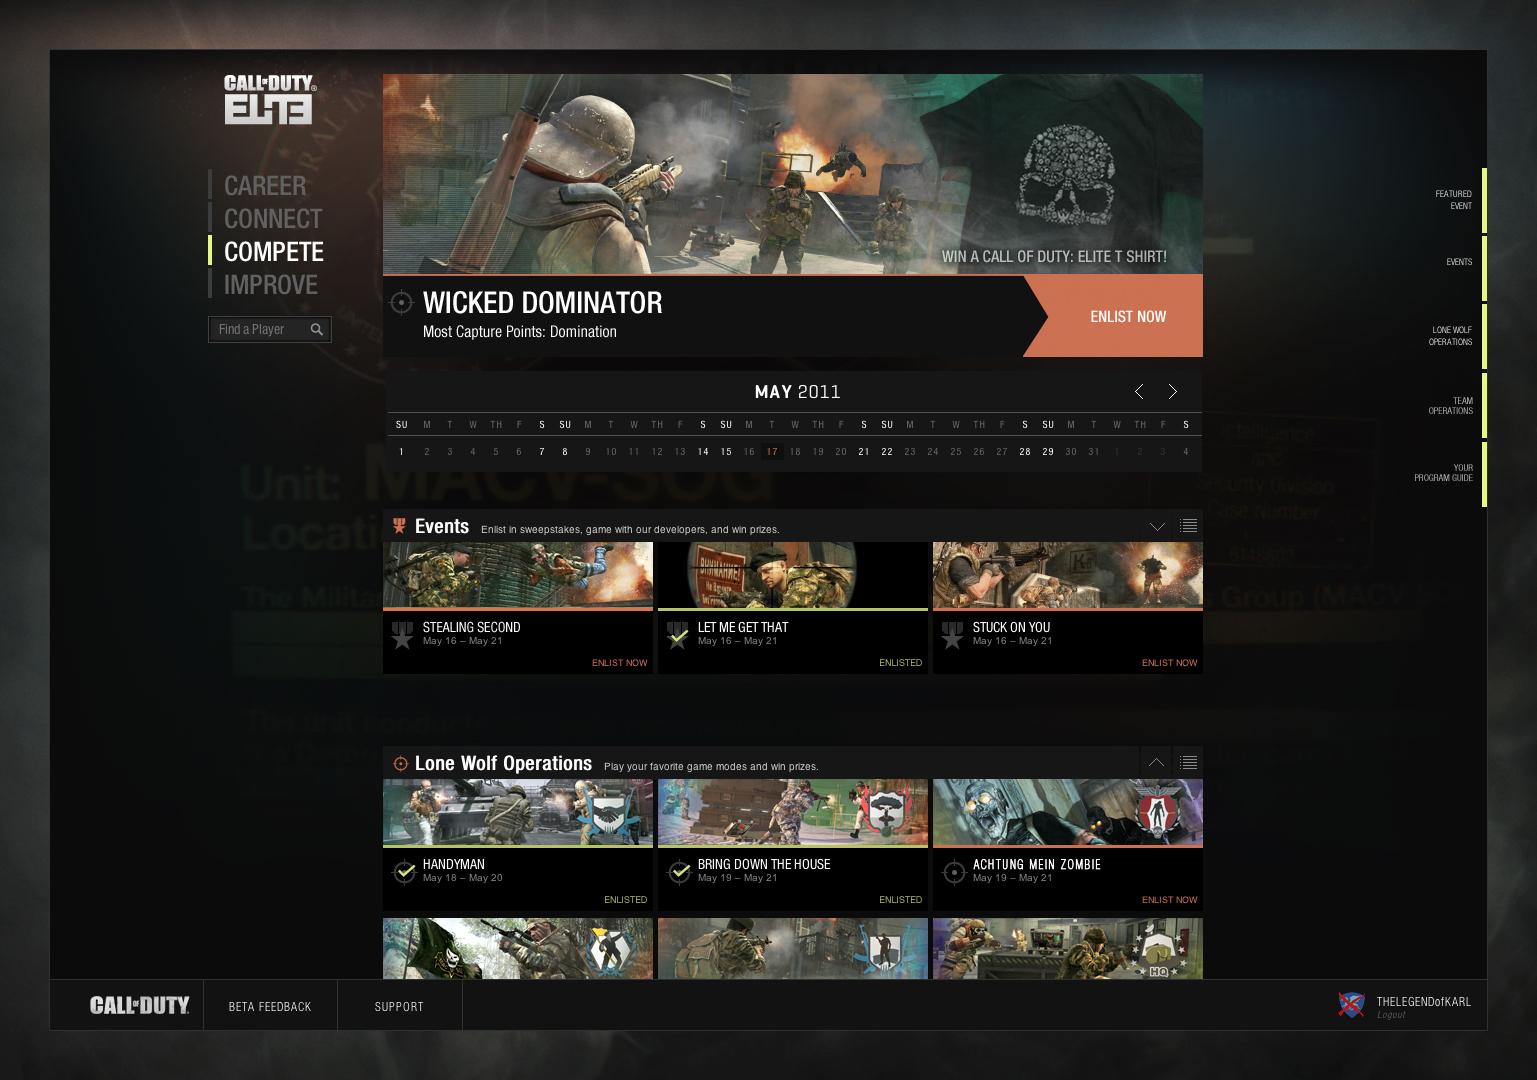 Call of Duty Elite: πολλοί το χλεύασαν, ακόμα περισσότεροι έσπευσαν να τα ακουμπήσουν για να γραφτούν συνδρομητές.